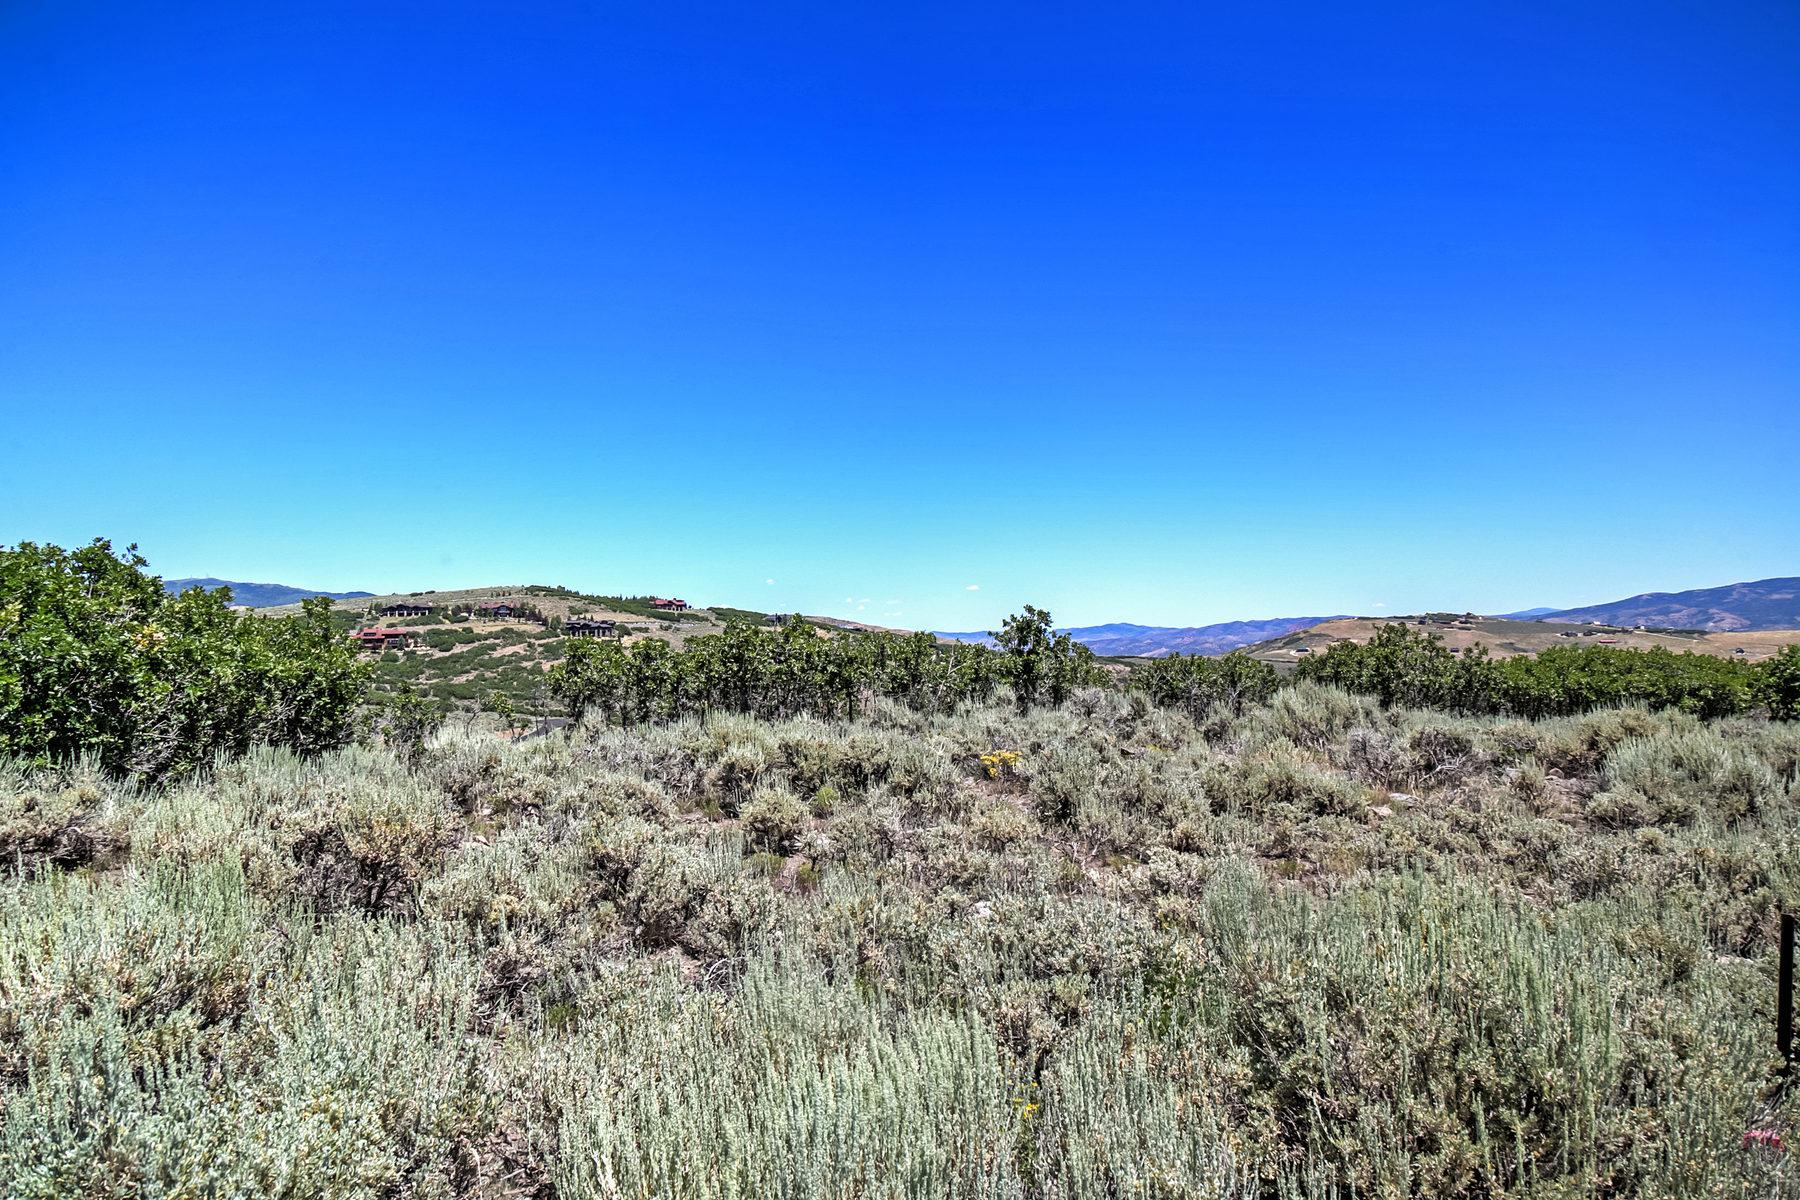 Đất đai vì Bán tại Apen Camp Lot In Promontory 3733 E Aspen Pt Lot #22 Park City, Utah, 84098 Hoa Kỳ